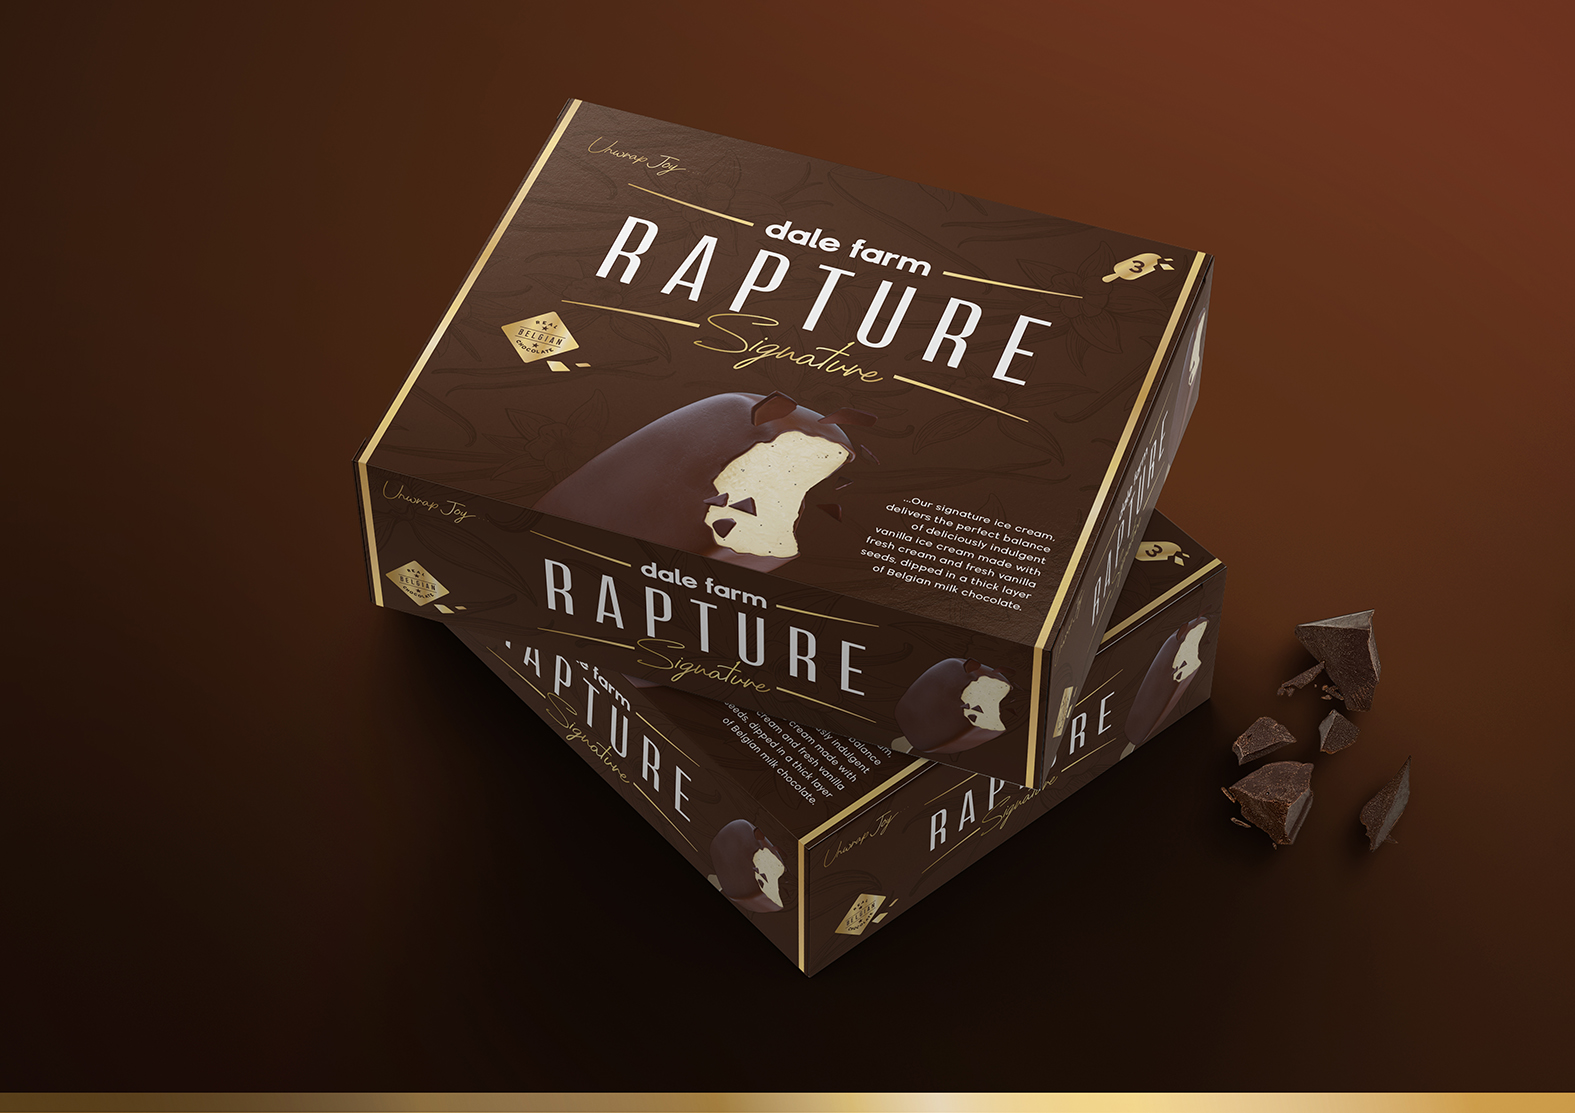 Simon Pendry Creative Redesign of Dale Farm Rapture Ice Cream Bars